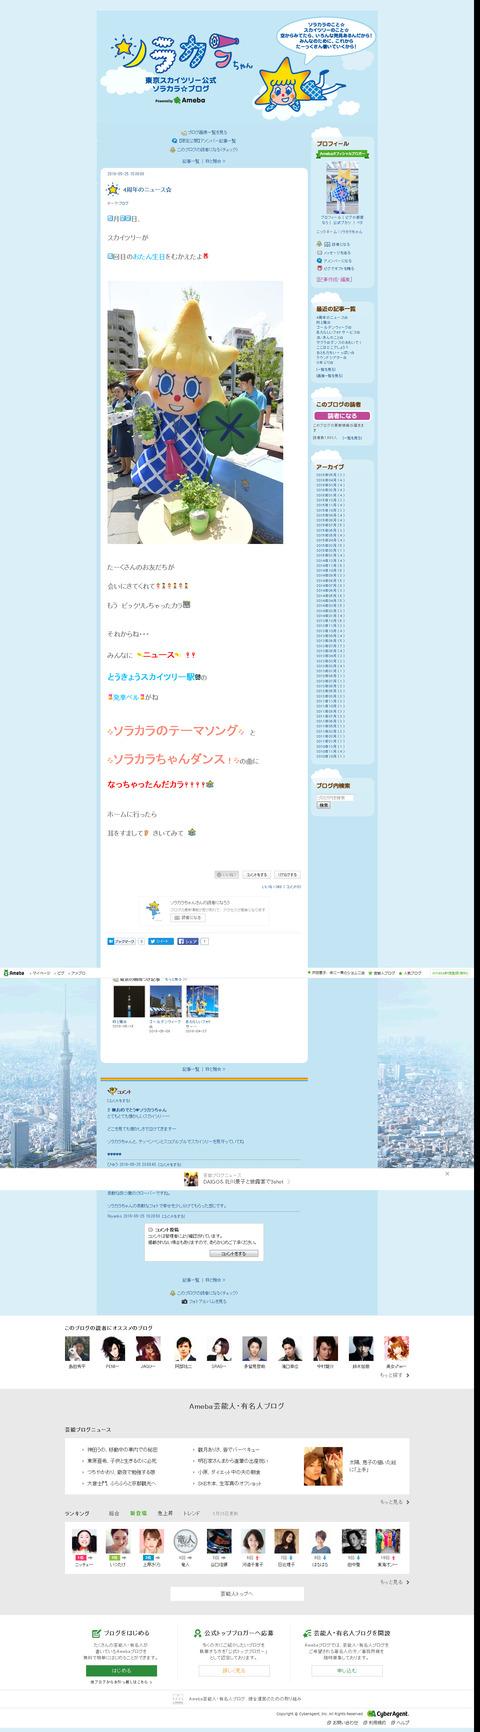 6f7b1b2a.jpg